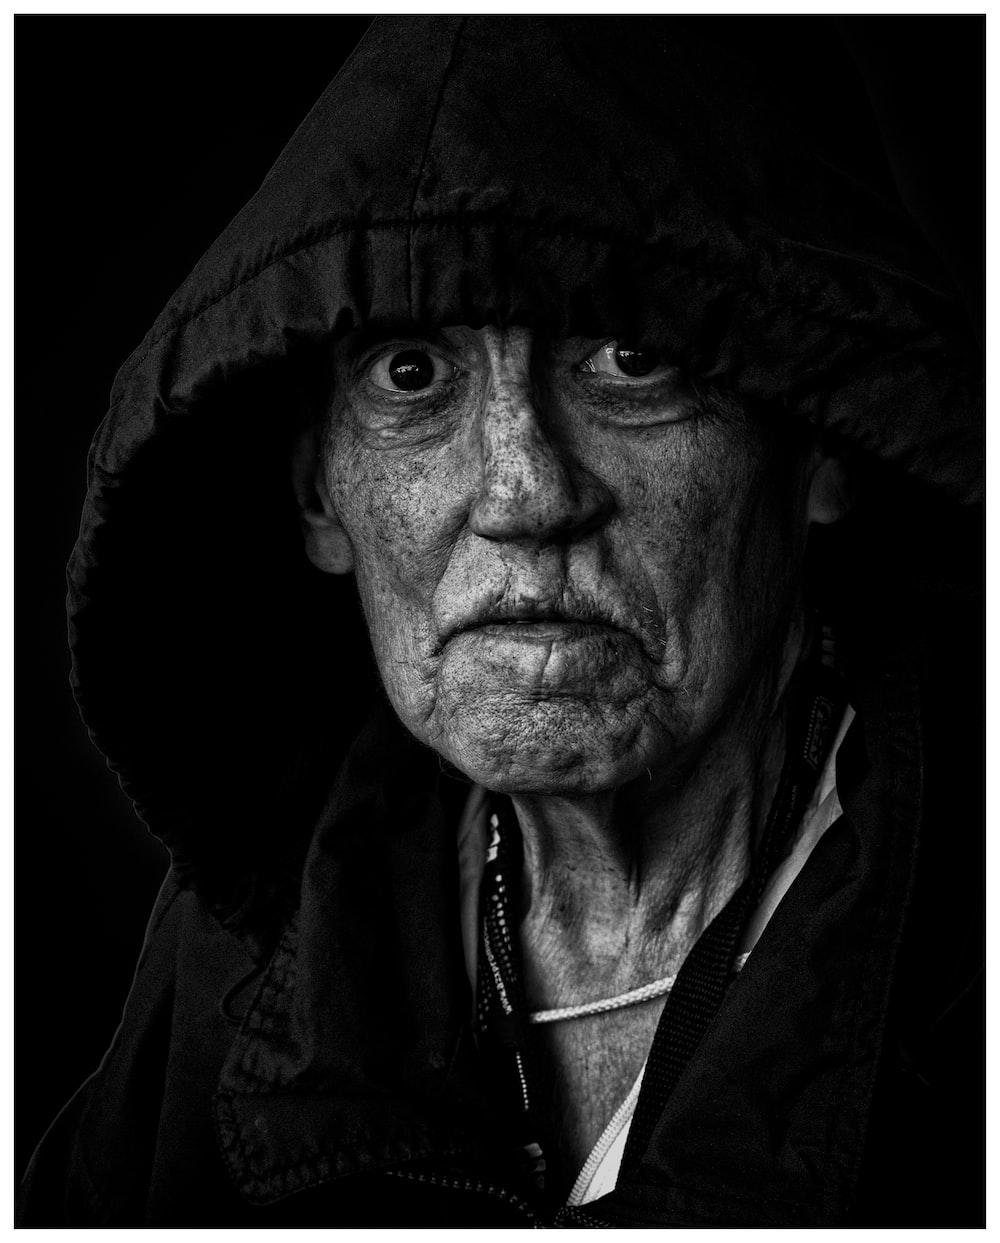 grayscale photo of man wearing black jacket